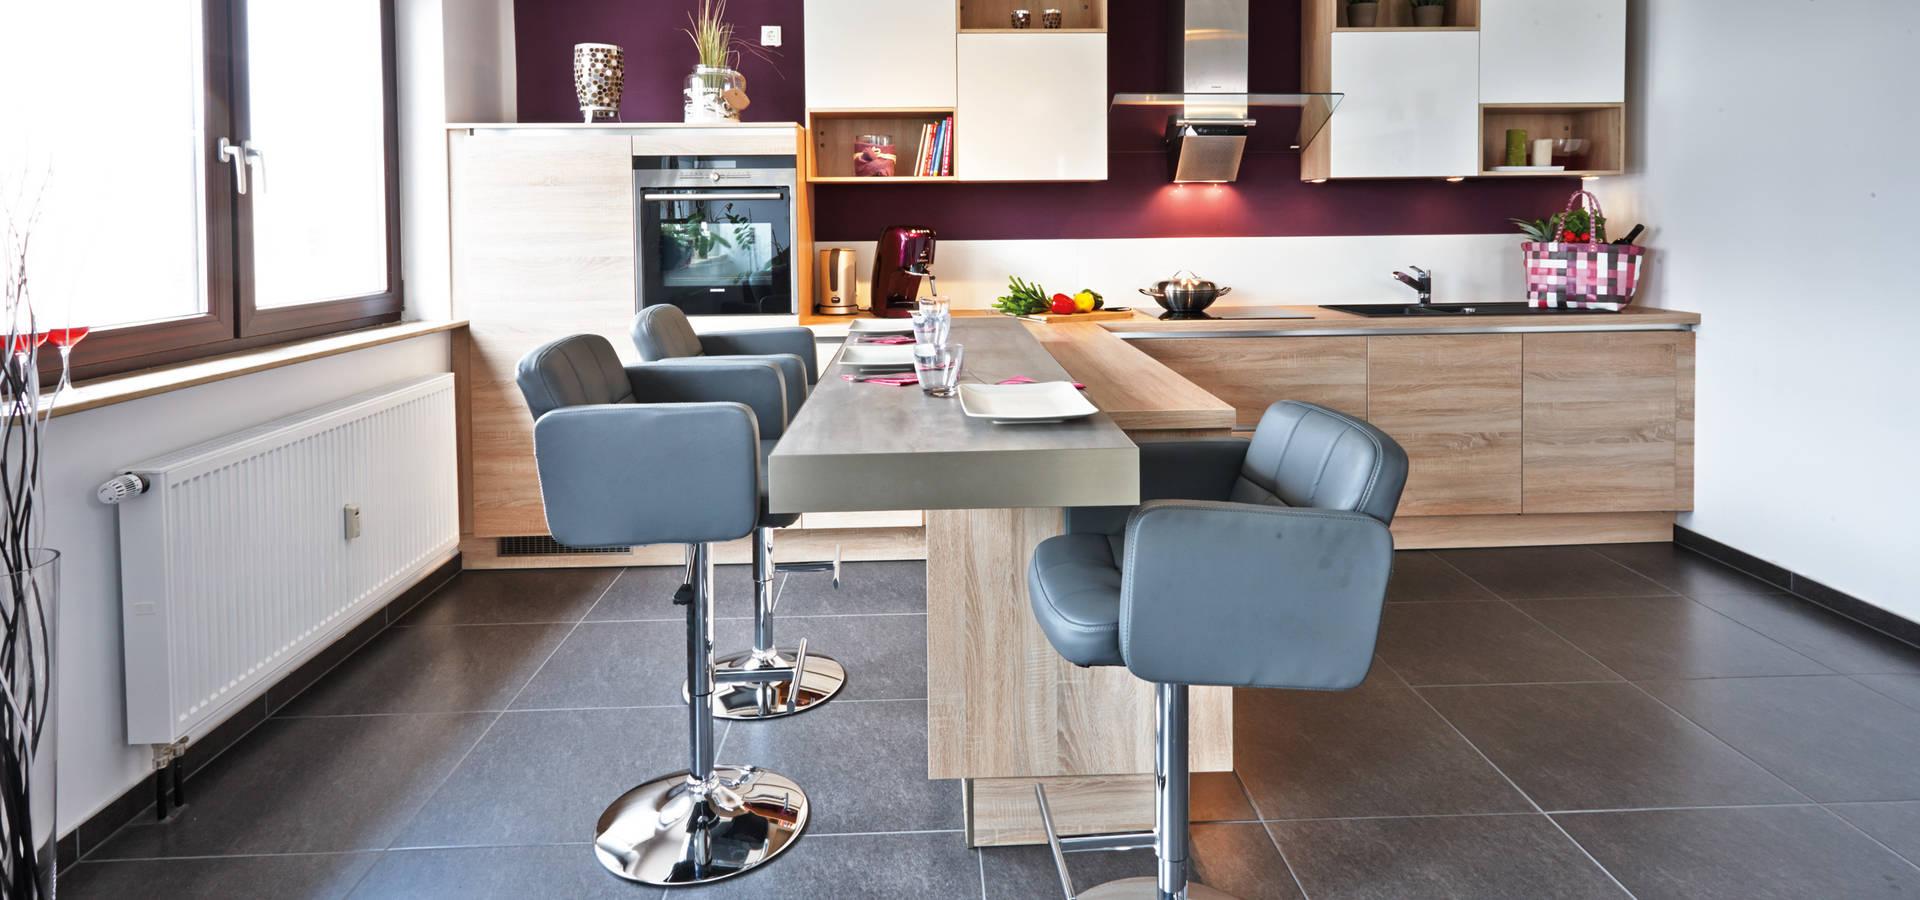 rustikaler landhaus traum im altbau por k chen quelle homify. Black Bedroom Furniture Sets. Home Design Ideas